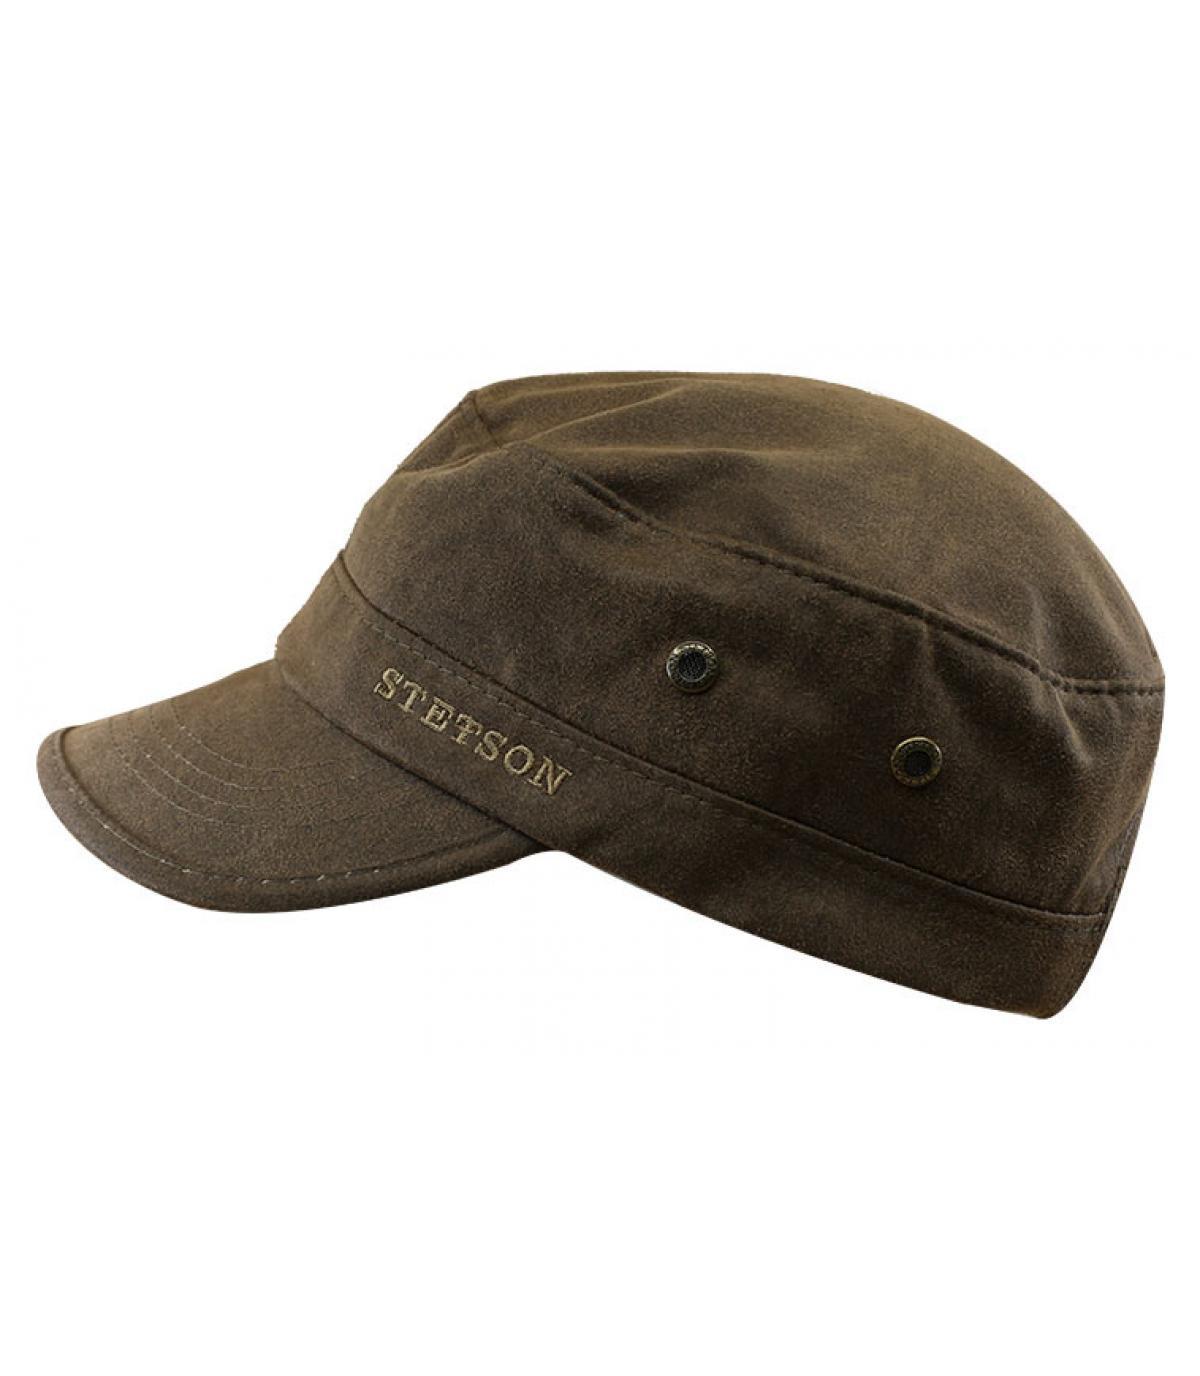 Details Army Cap CO/PES brown - afbeeling 2